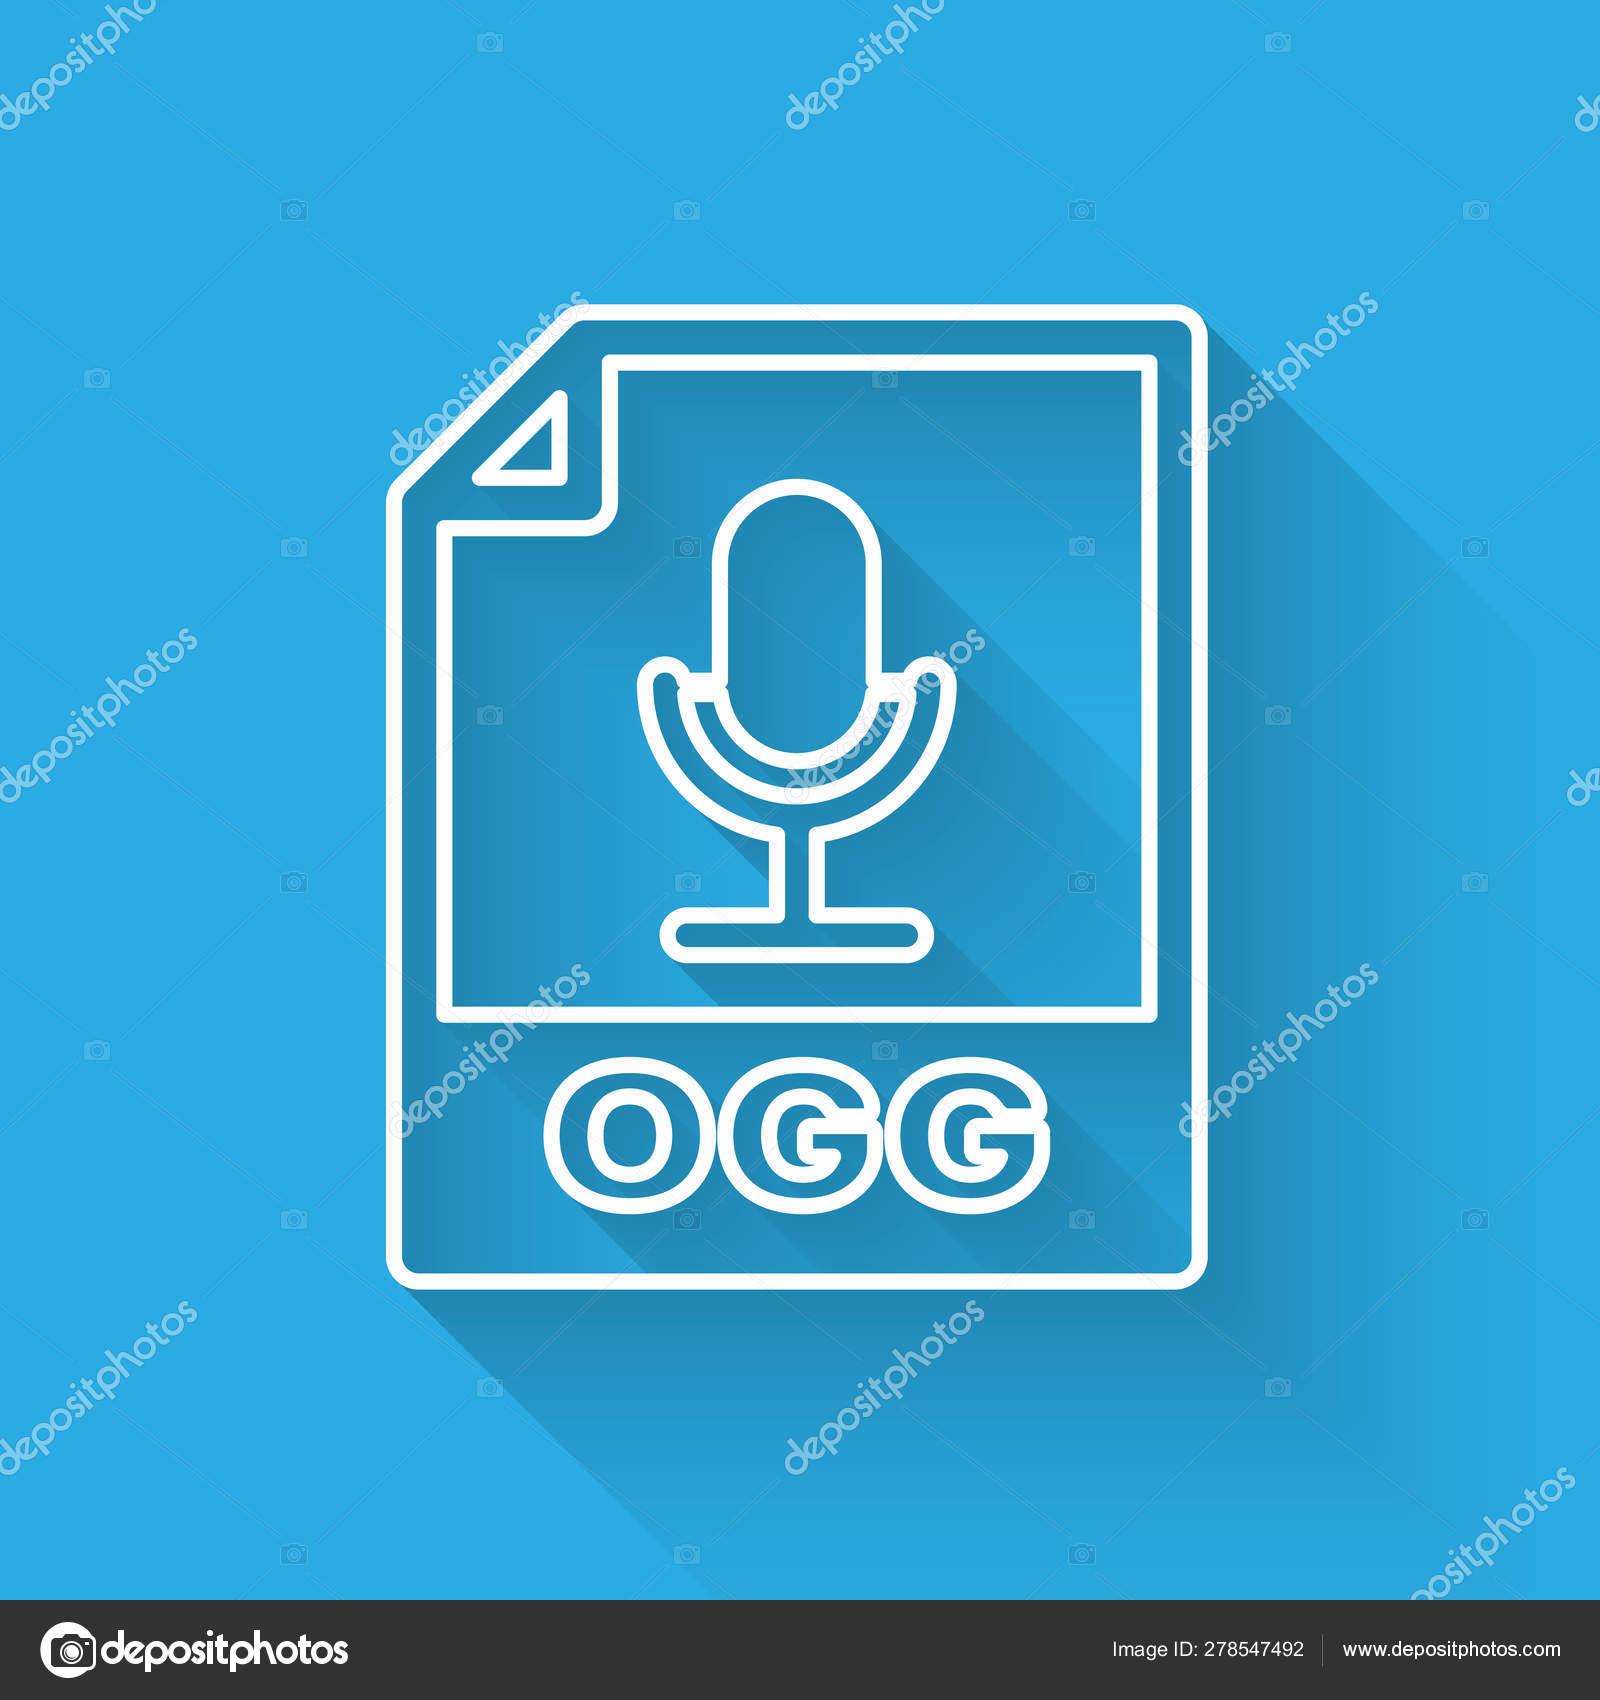 White OGG file document icon  Download ogg button line icon